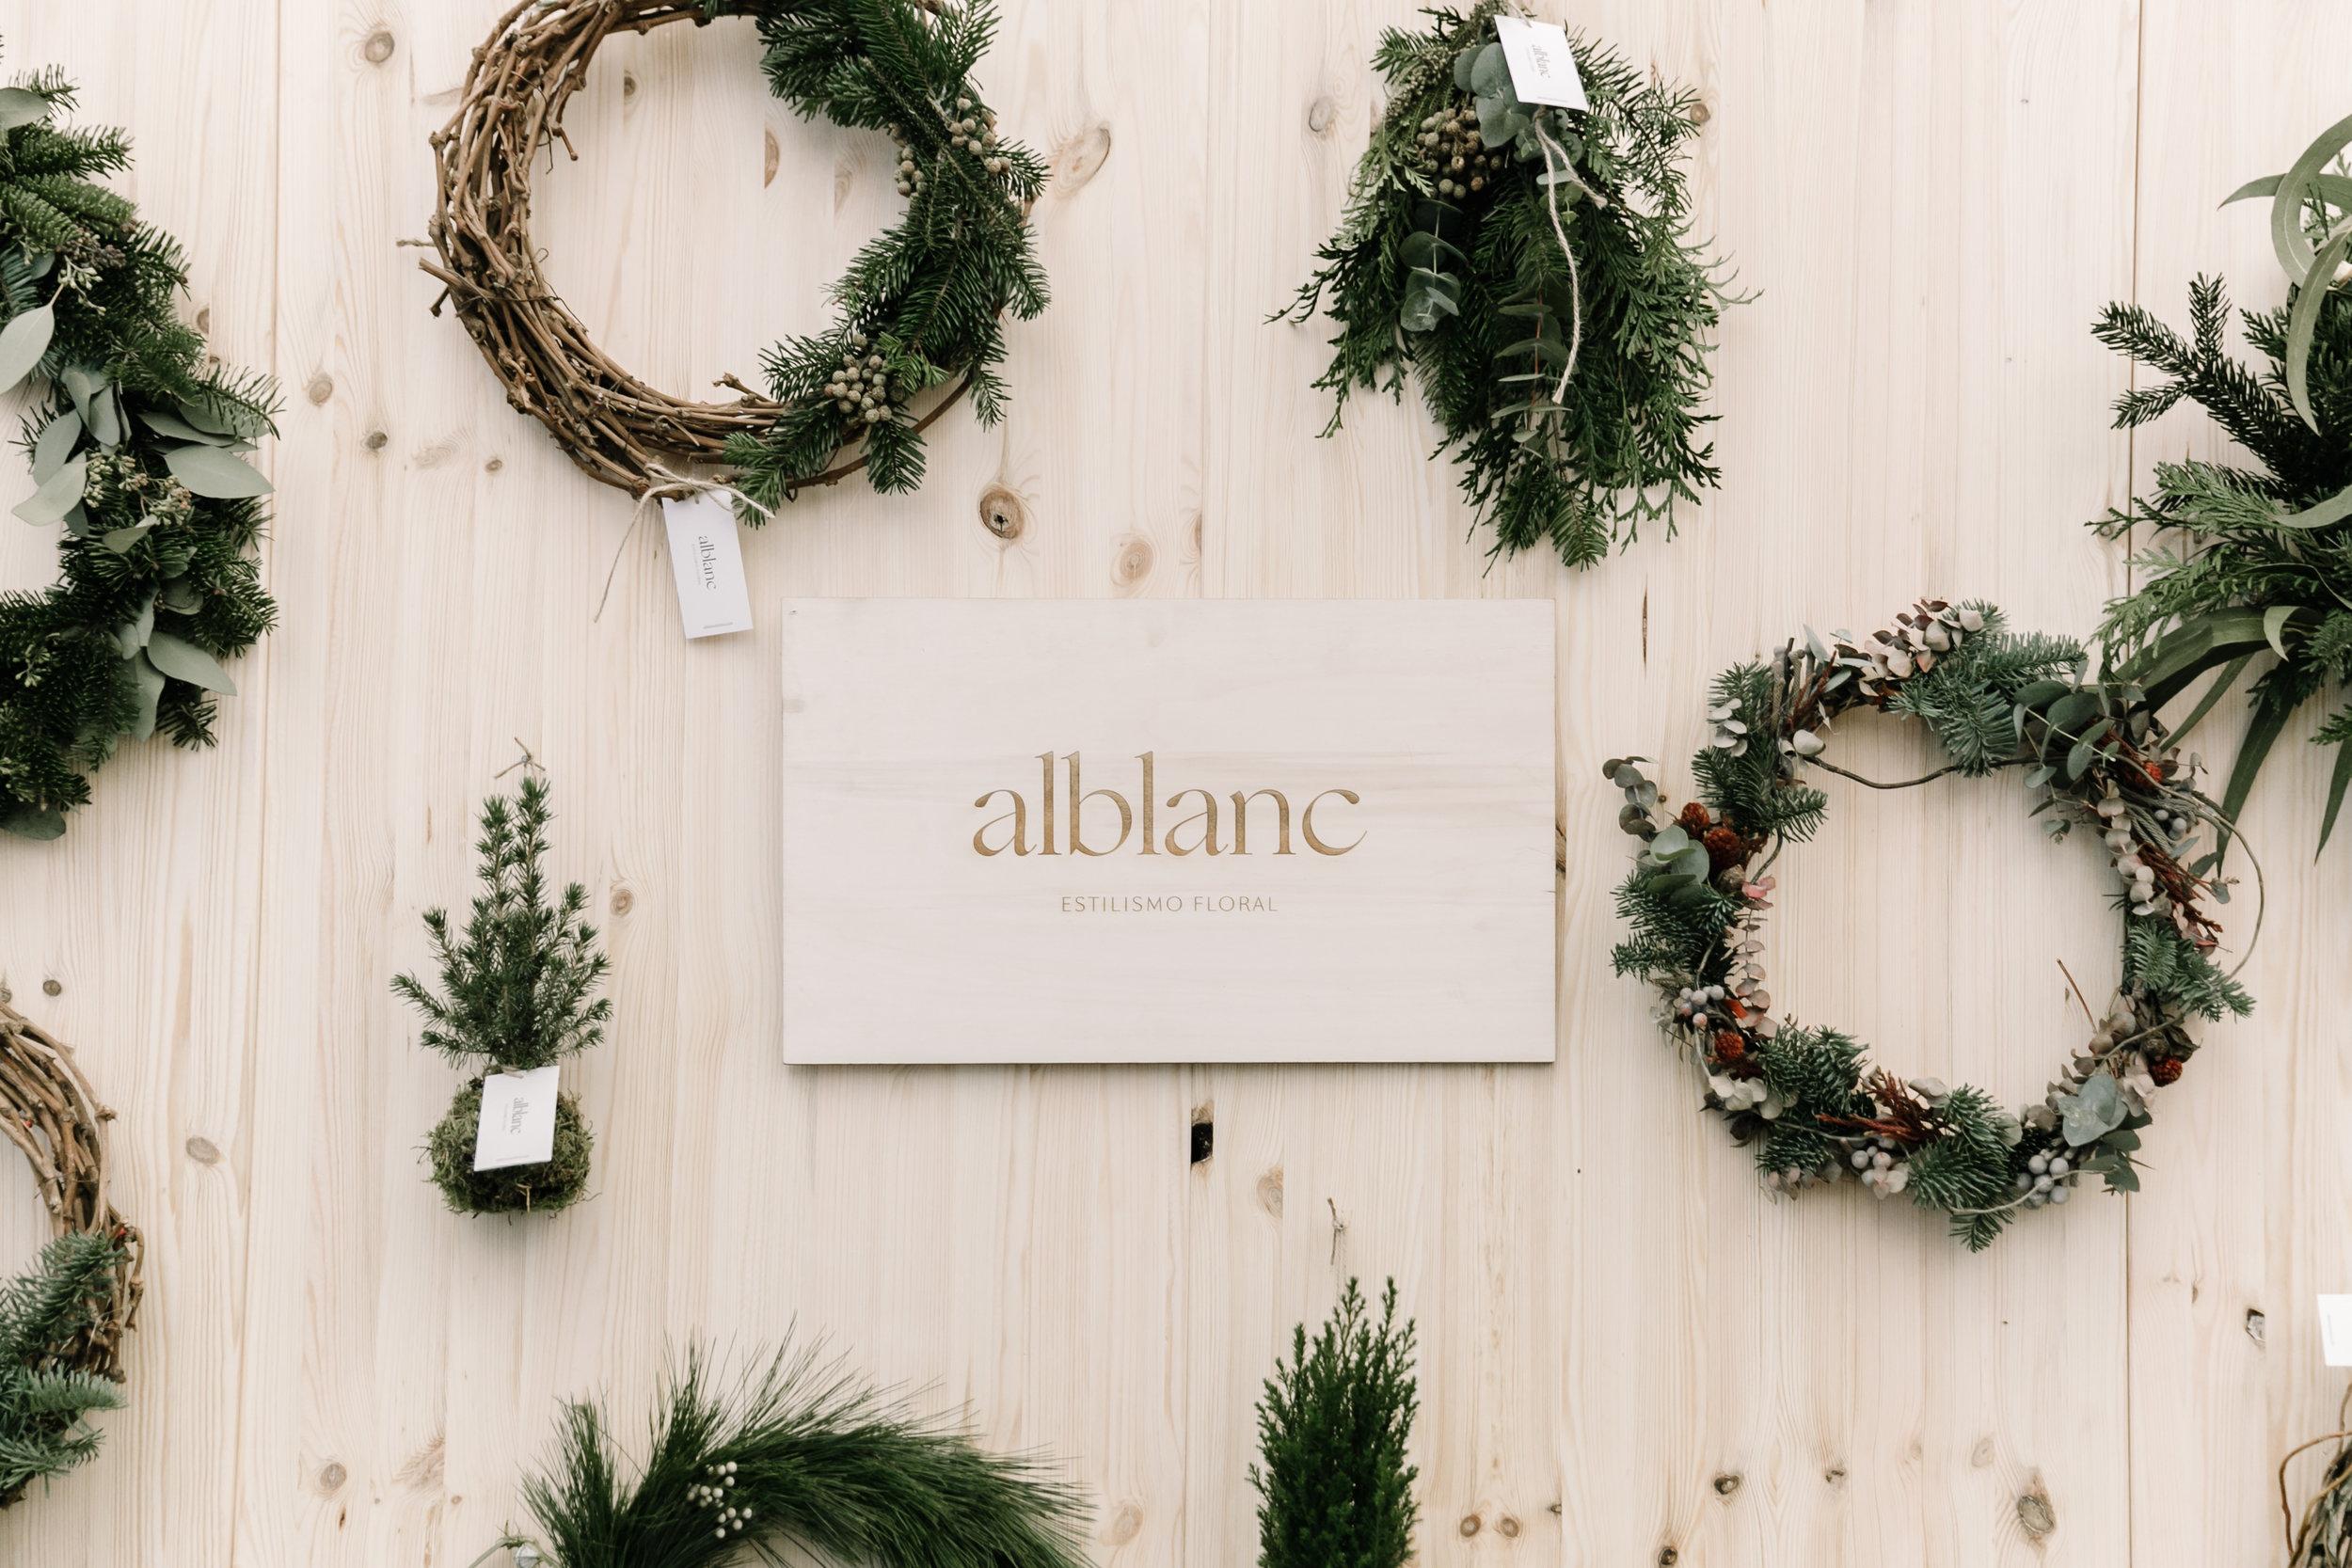 20161217-alblanc-singulares-002.jpg